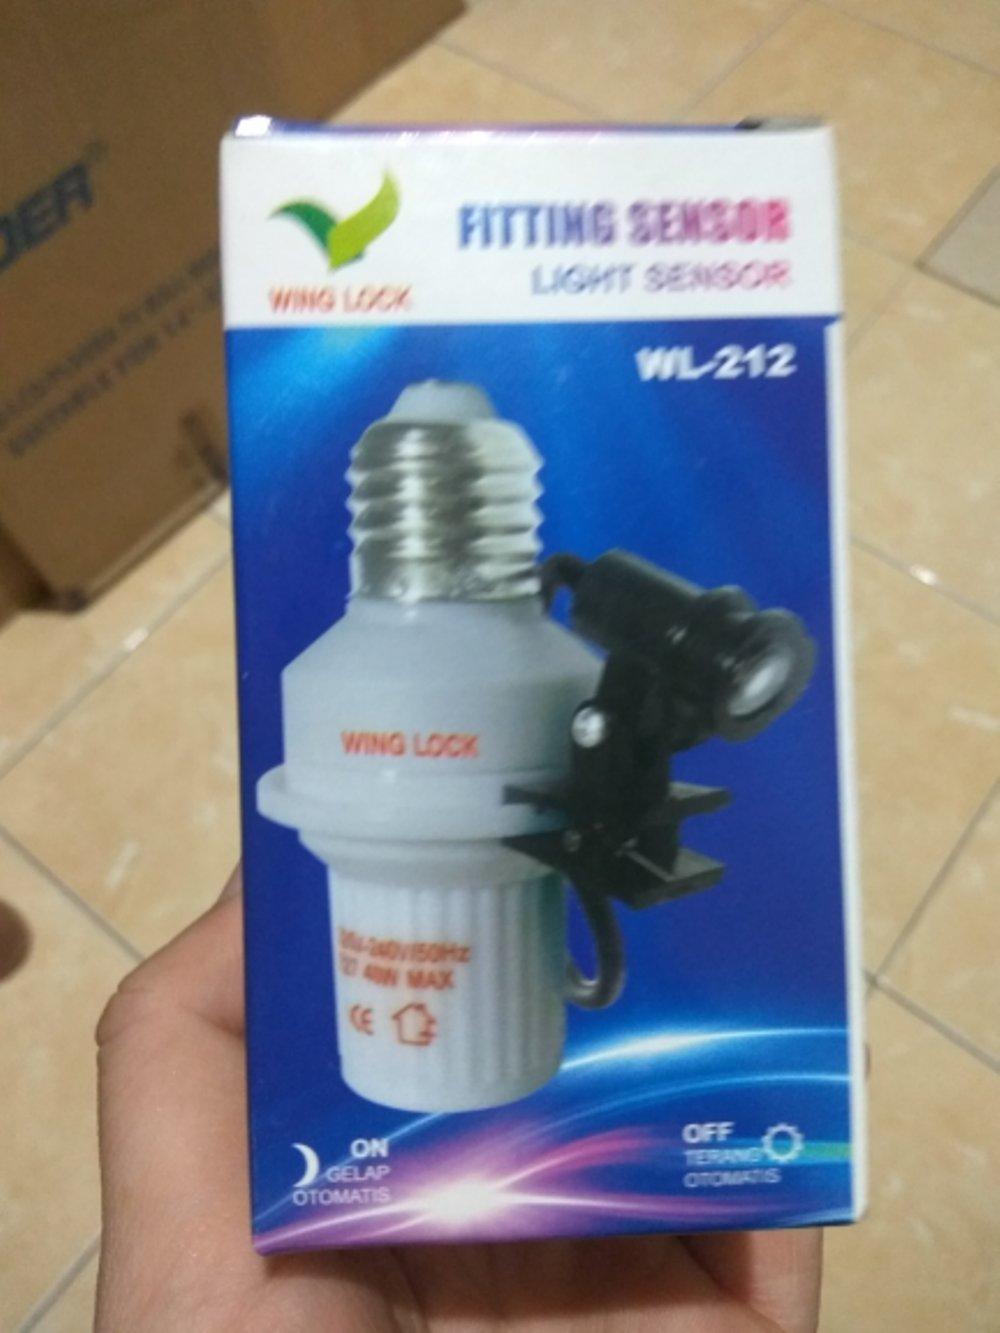 Fitting Sensor Cahaya Terbagus Light Sensor 220V 40W Night Swicth